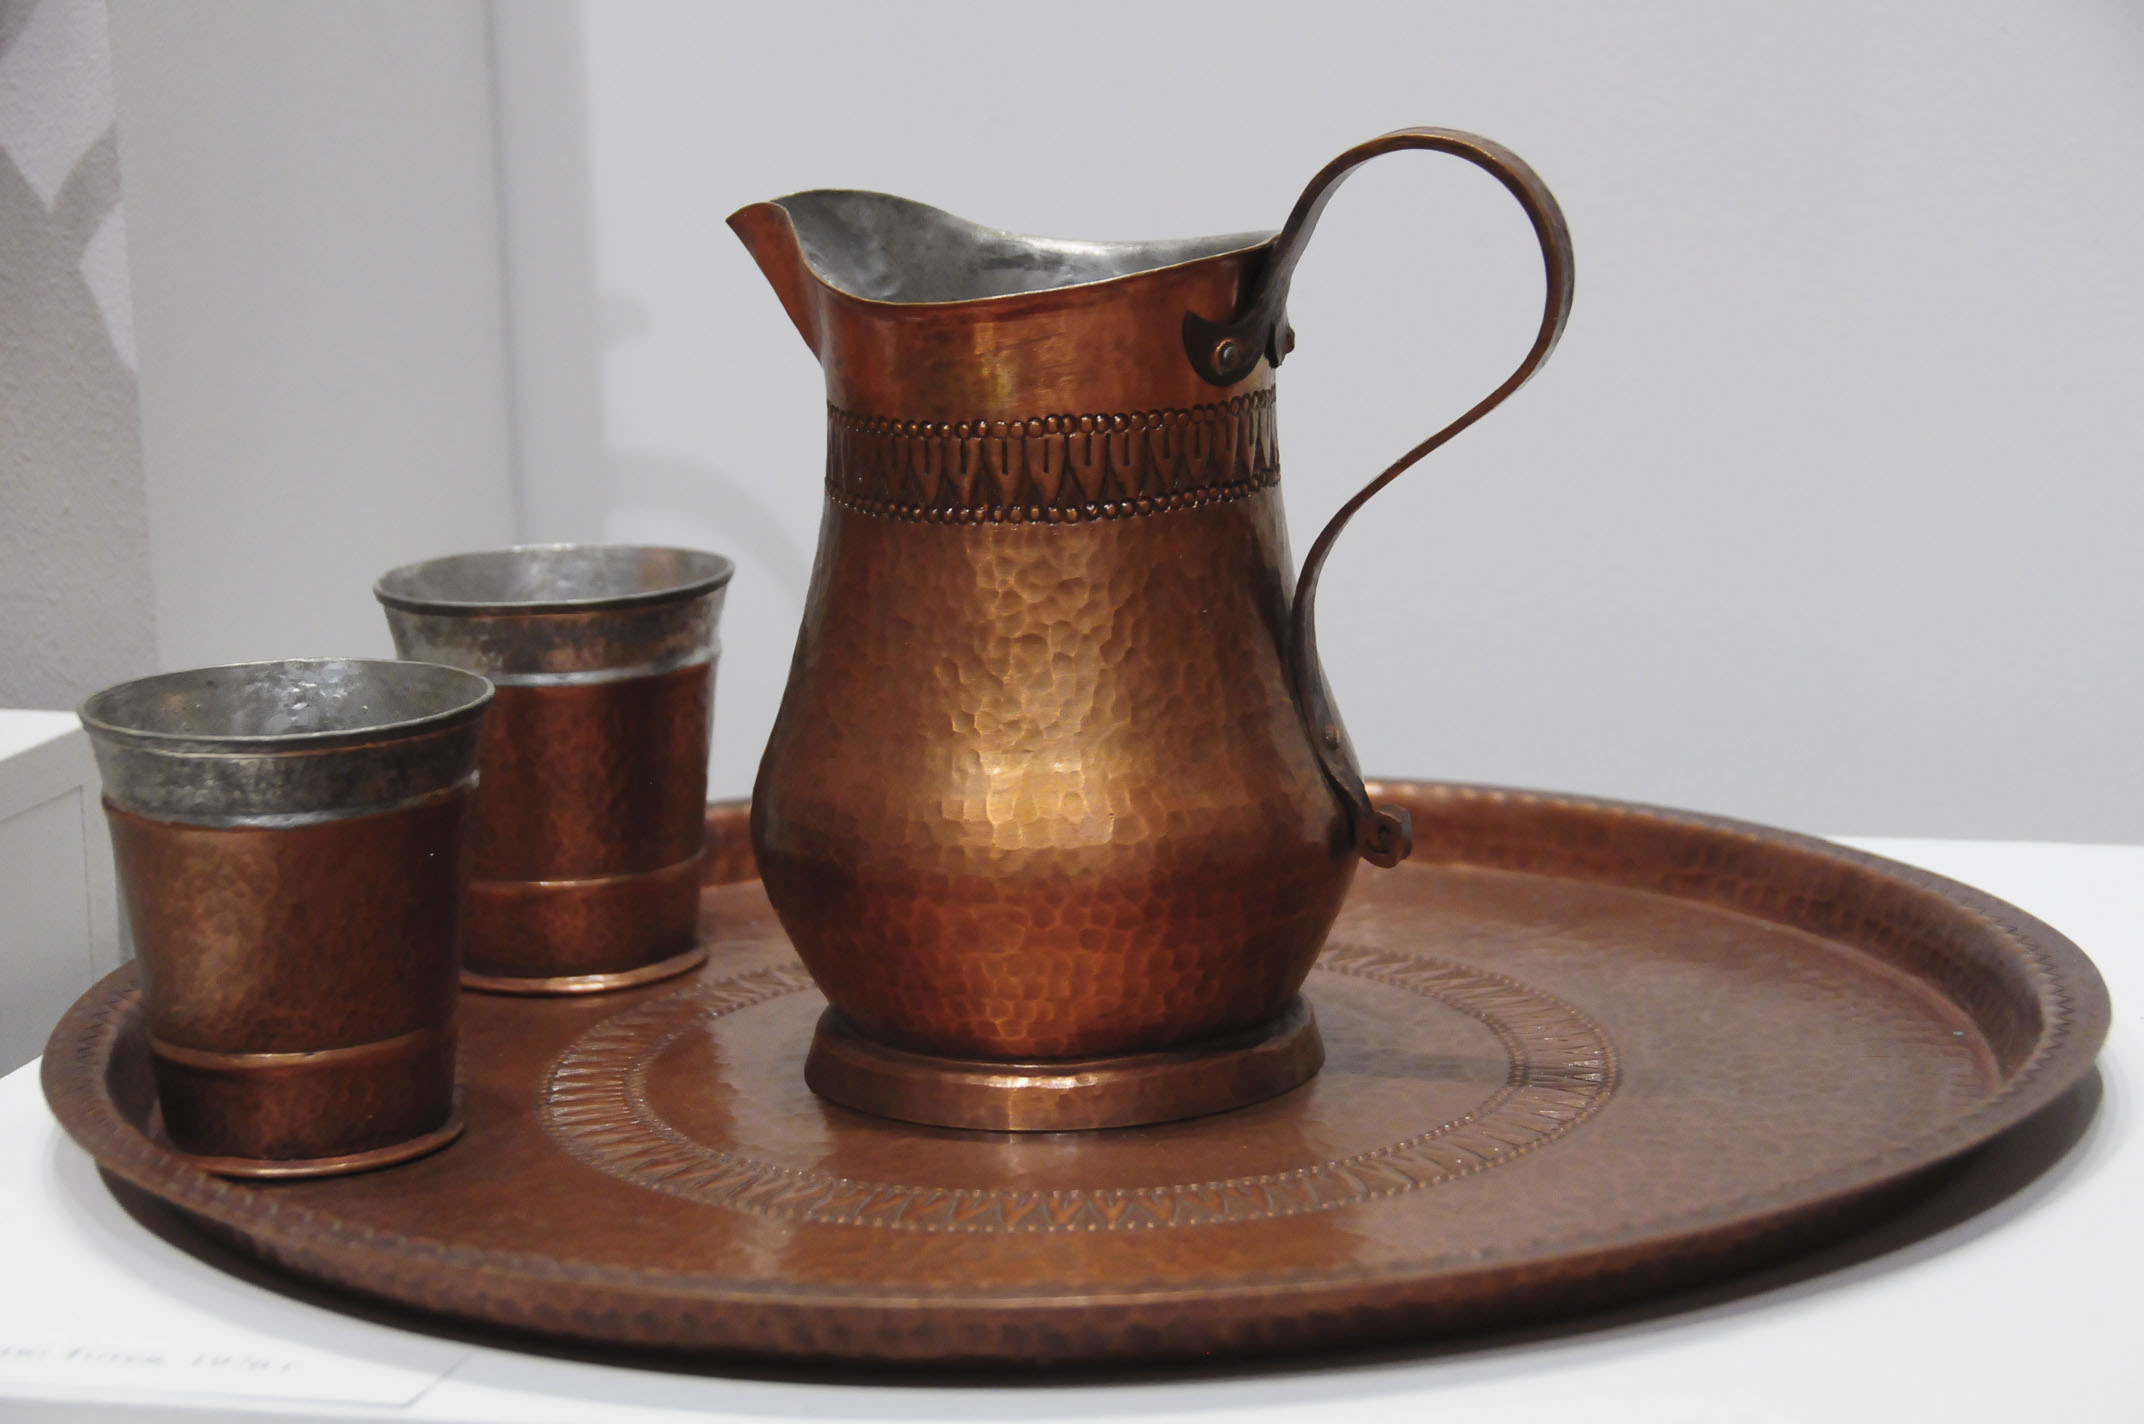 troyan-museum-mednikarstvo-ot-troyanskiq-krai-23